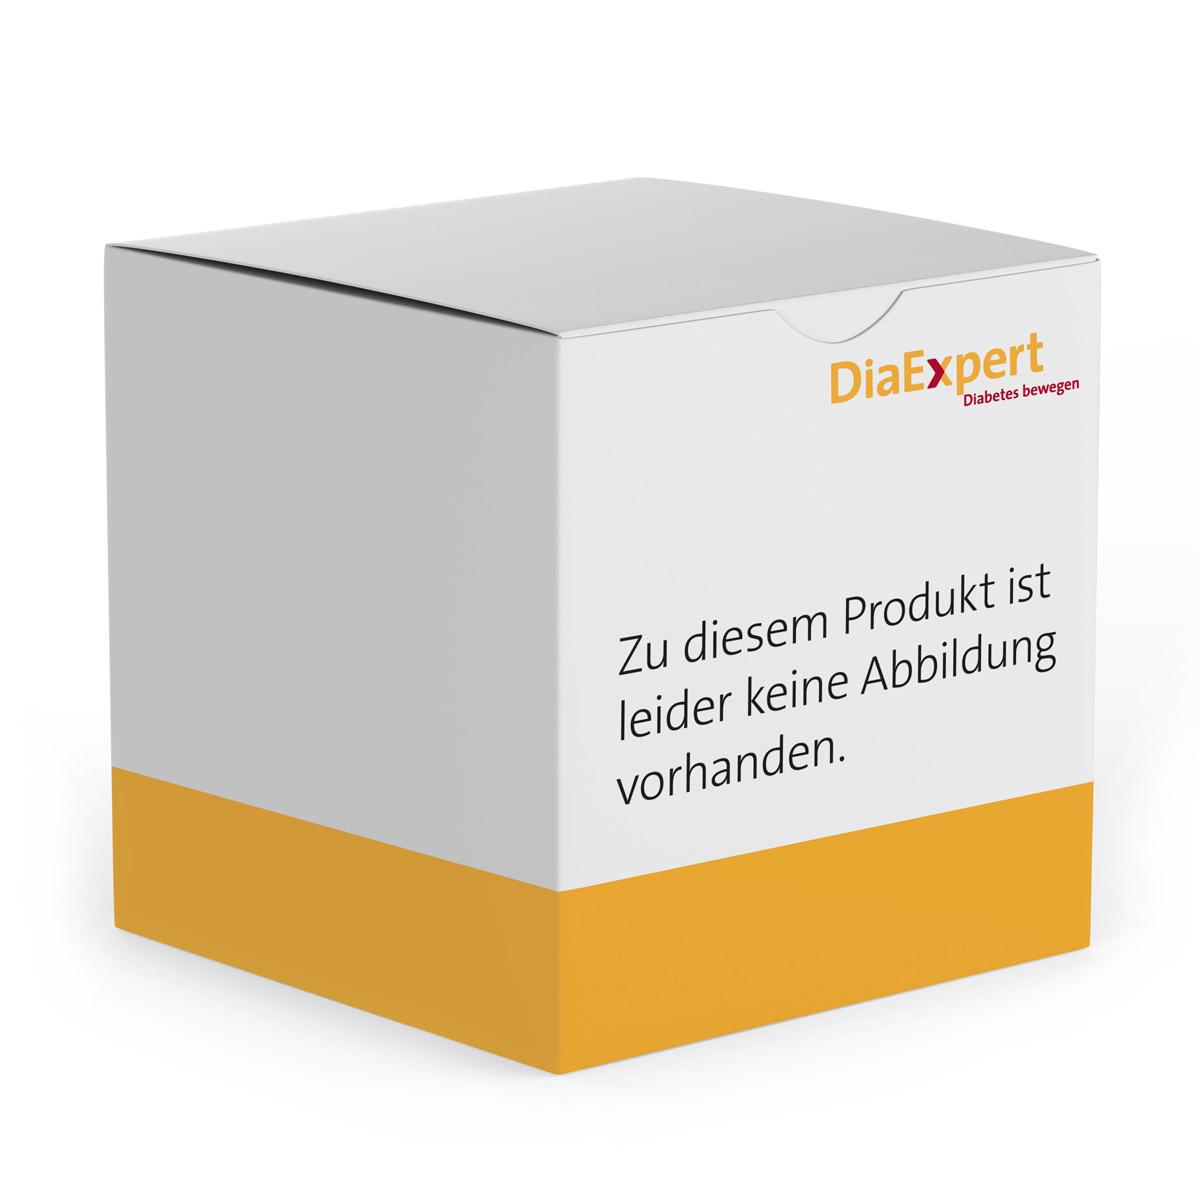 OneTouch Ultra Plus Reflect mmol/L